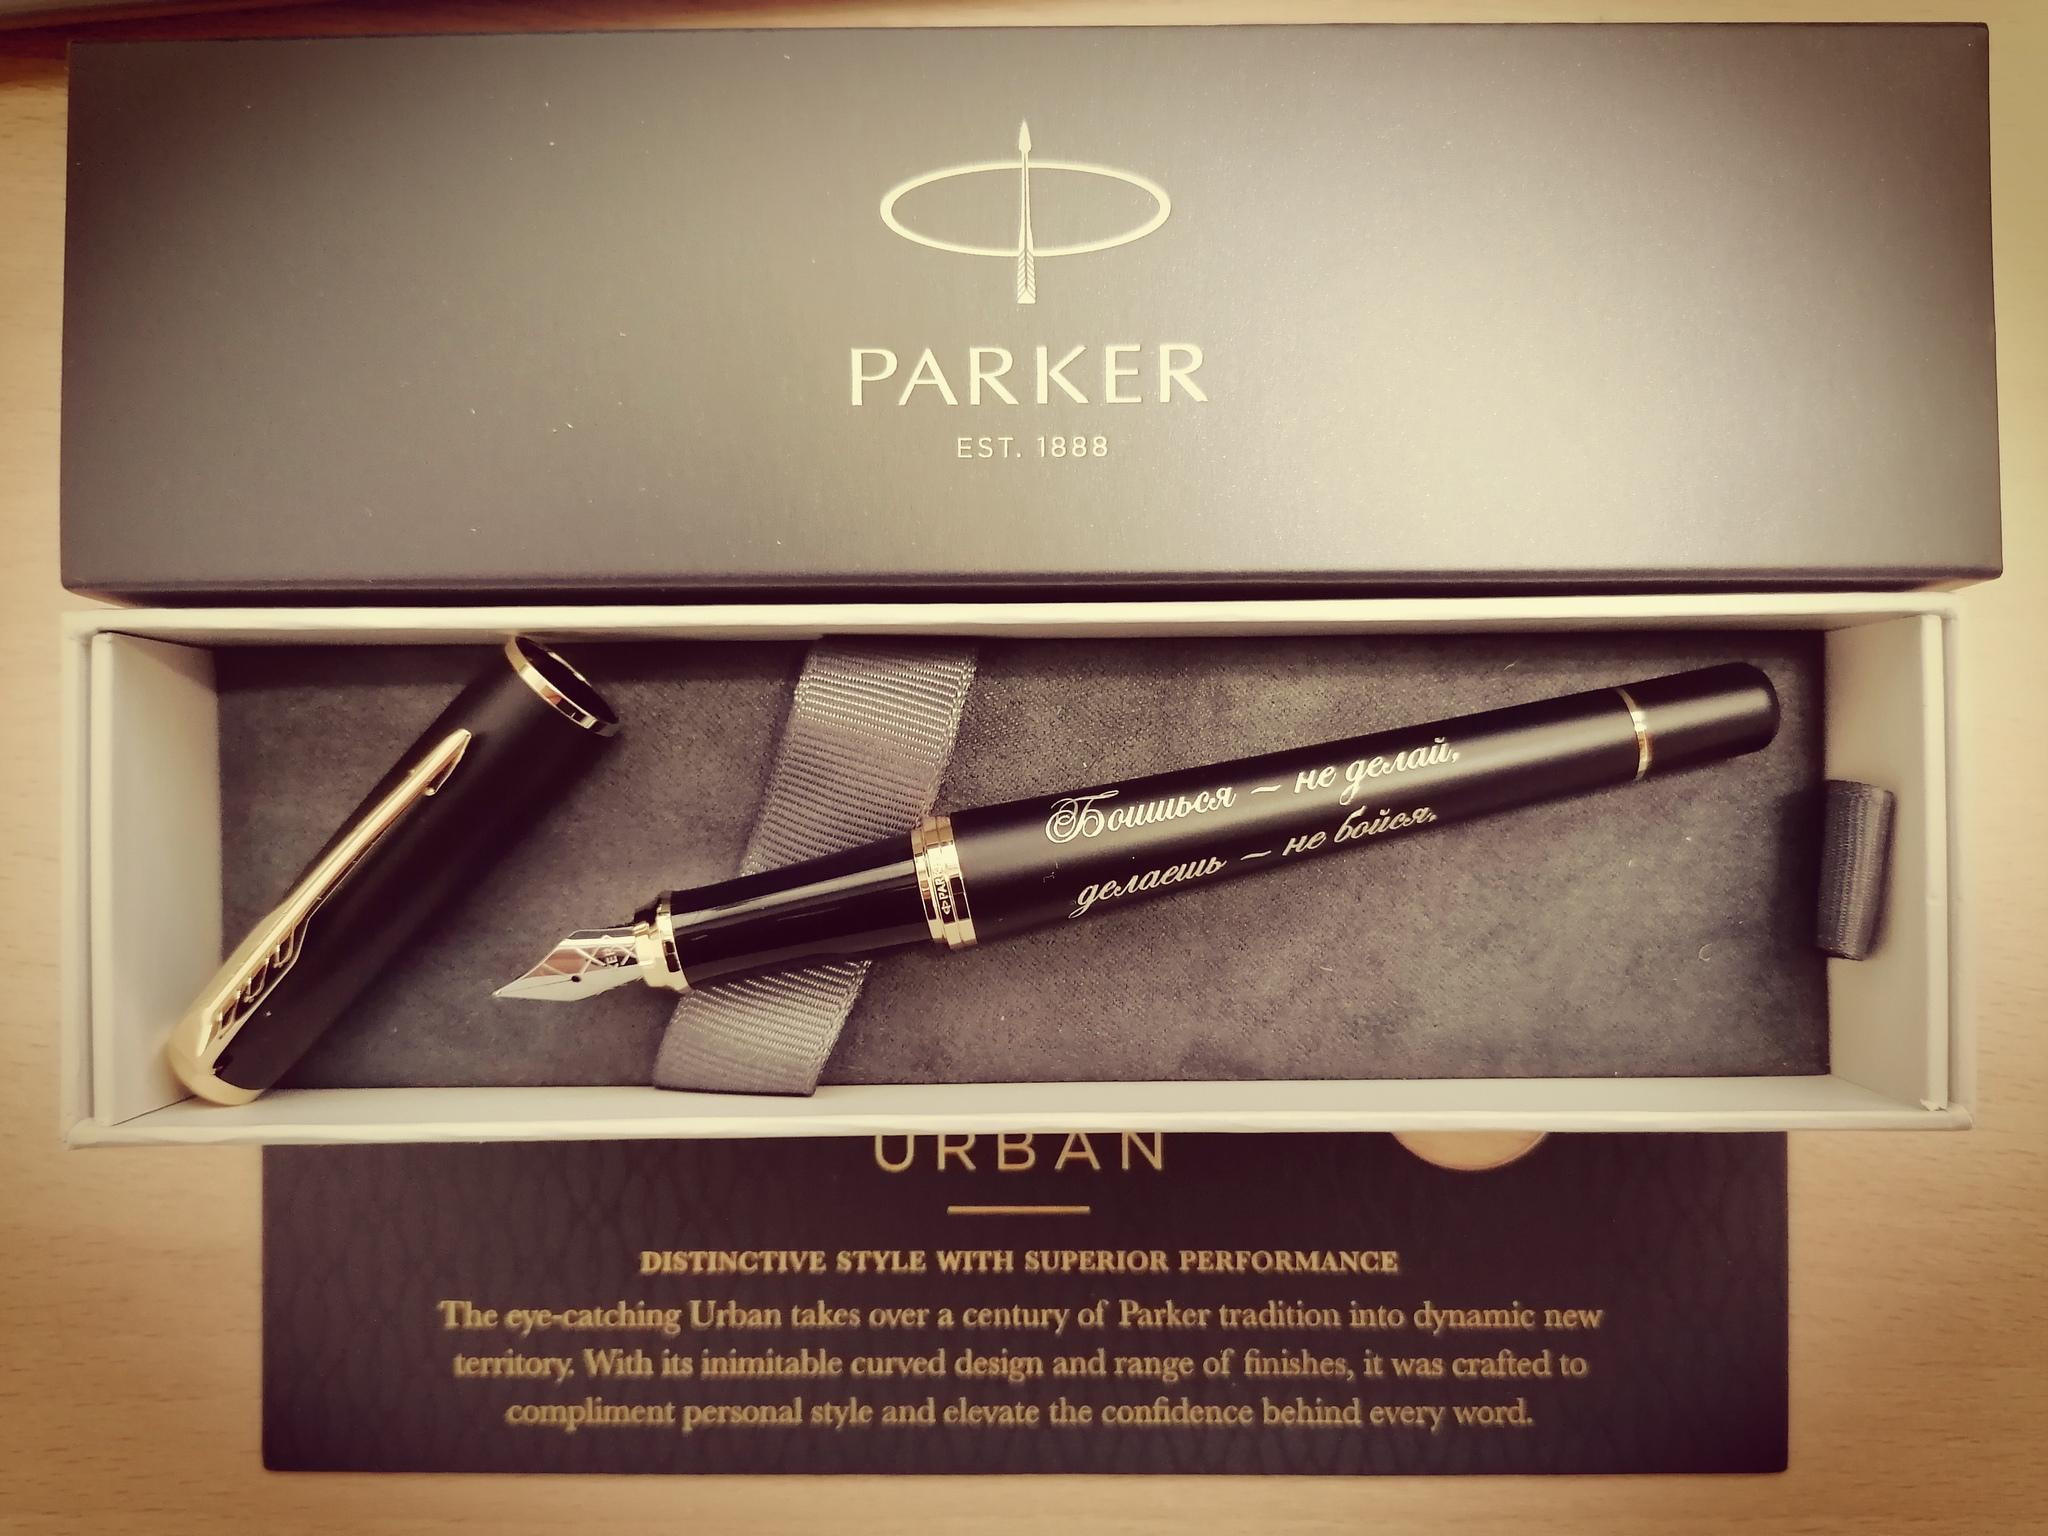 Пример № 25 (Перьевая) /  / Ручка: Parker Urban / Место нанесения: № 10 / Шрифт: Esenin script One / Артикул: 1931593